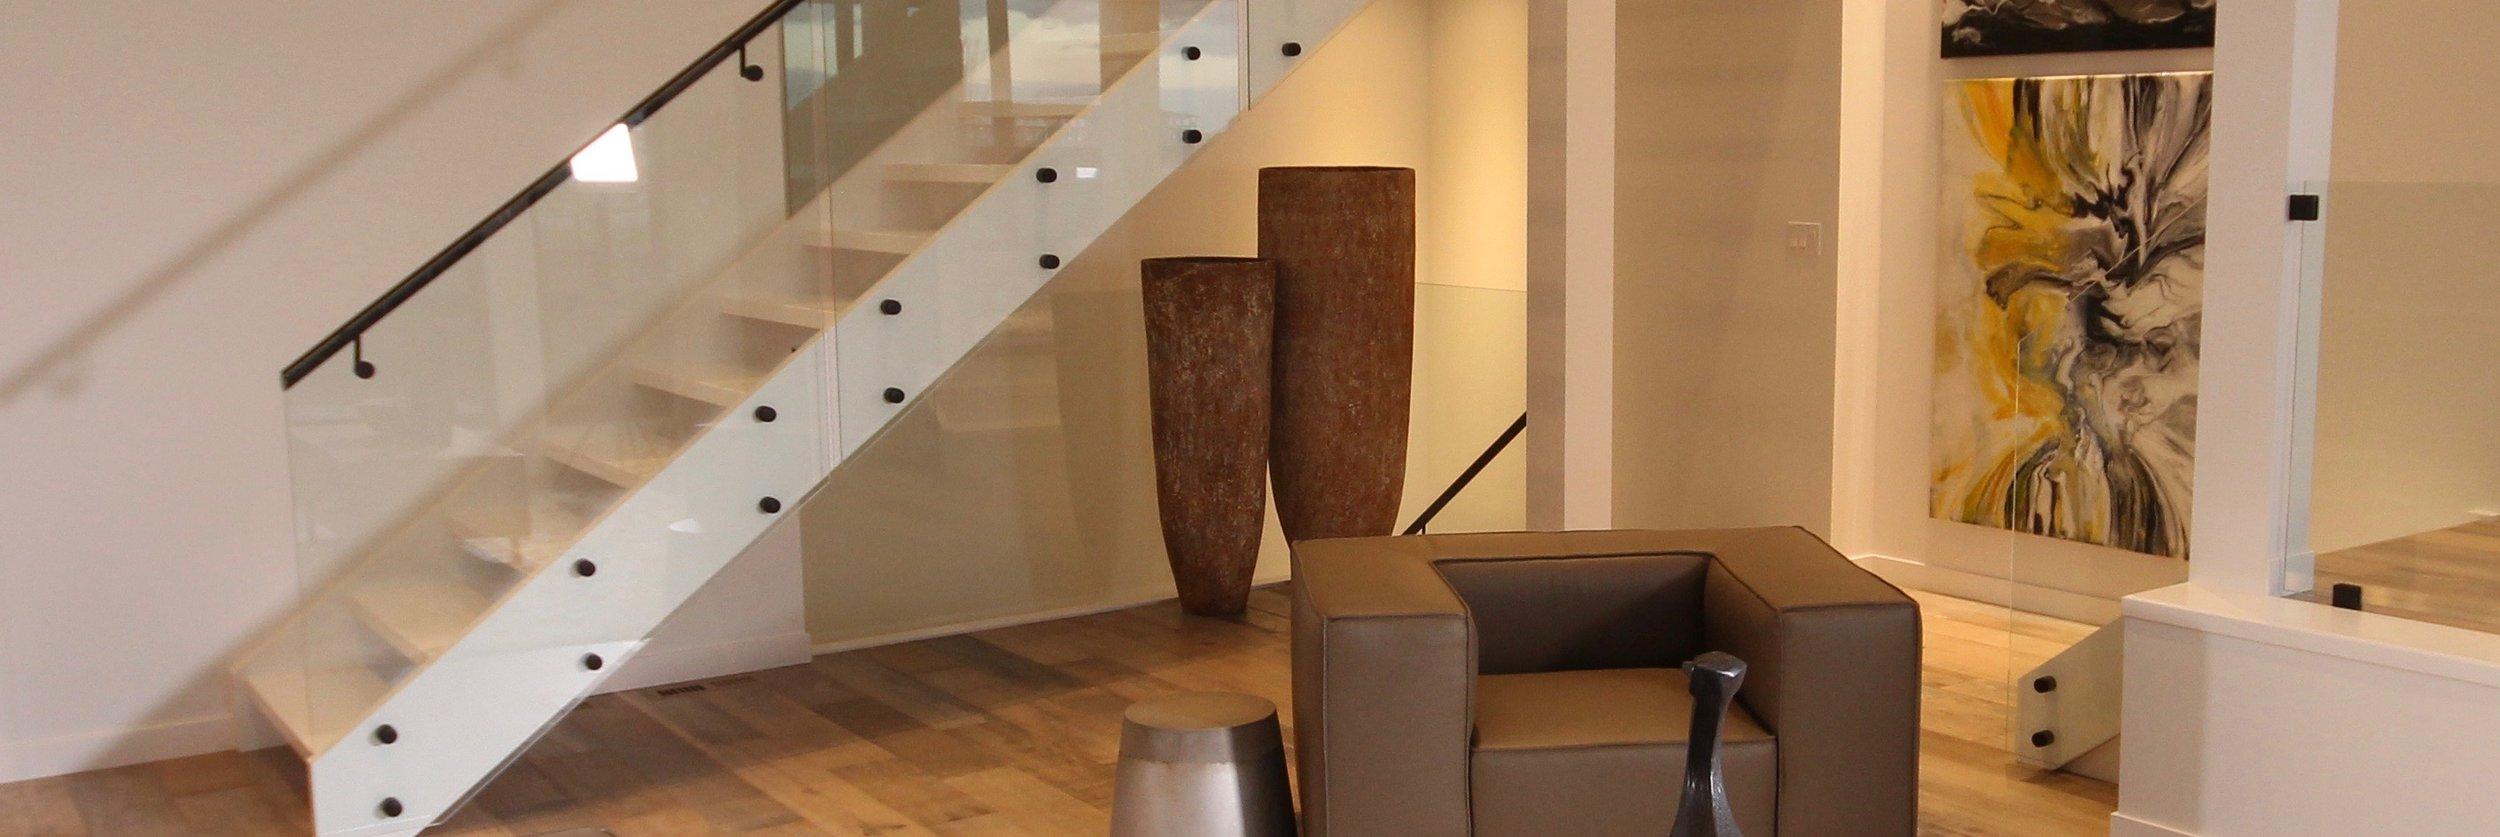 Copy of artifact standing pots in artista show home